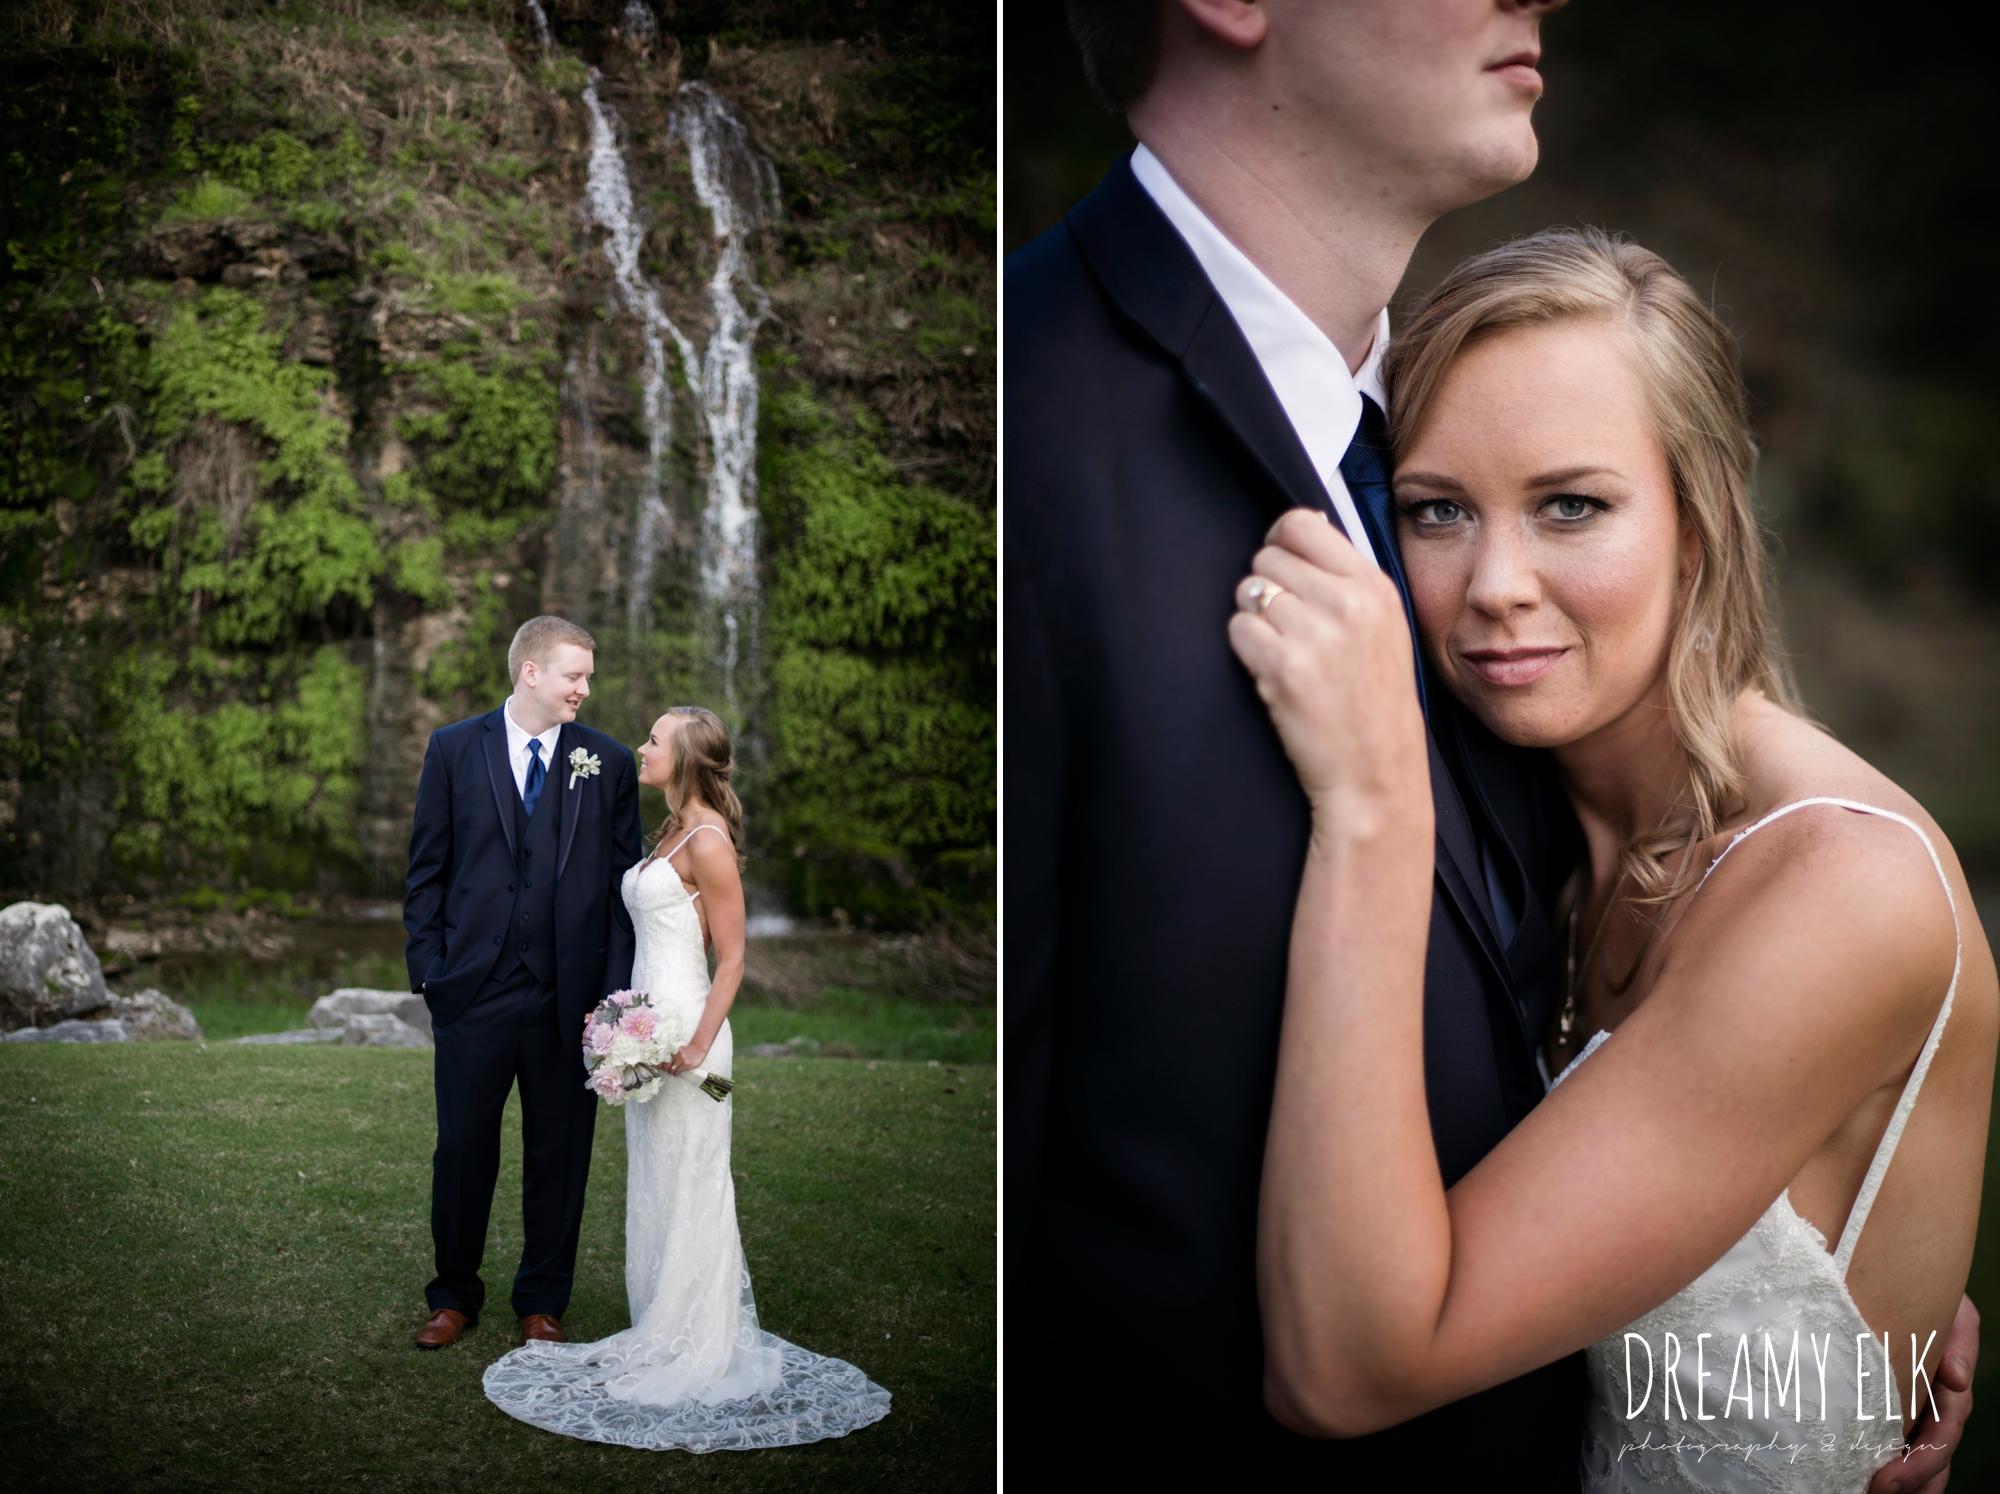 bride and groom, navy suit, backless column sheath wedding dress, cloudy march wedding photo, canyon springs golf club wedding, san antonio, texas {dreamy elk photography and design}